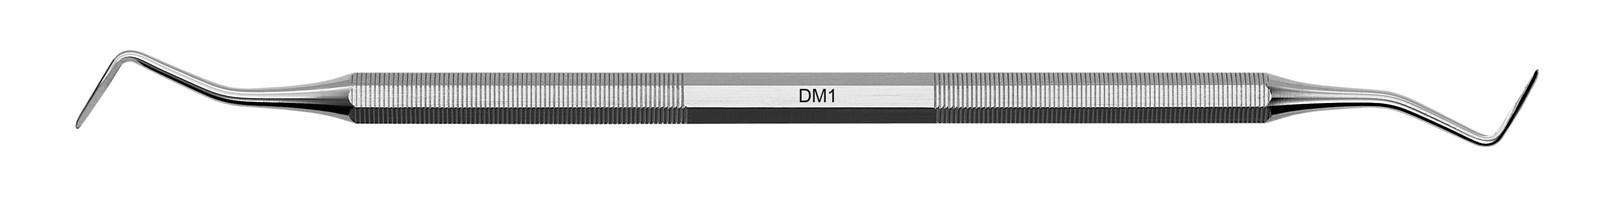 Lžičkové dlátko - DM1, ADEP tmavě modrý